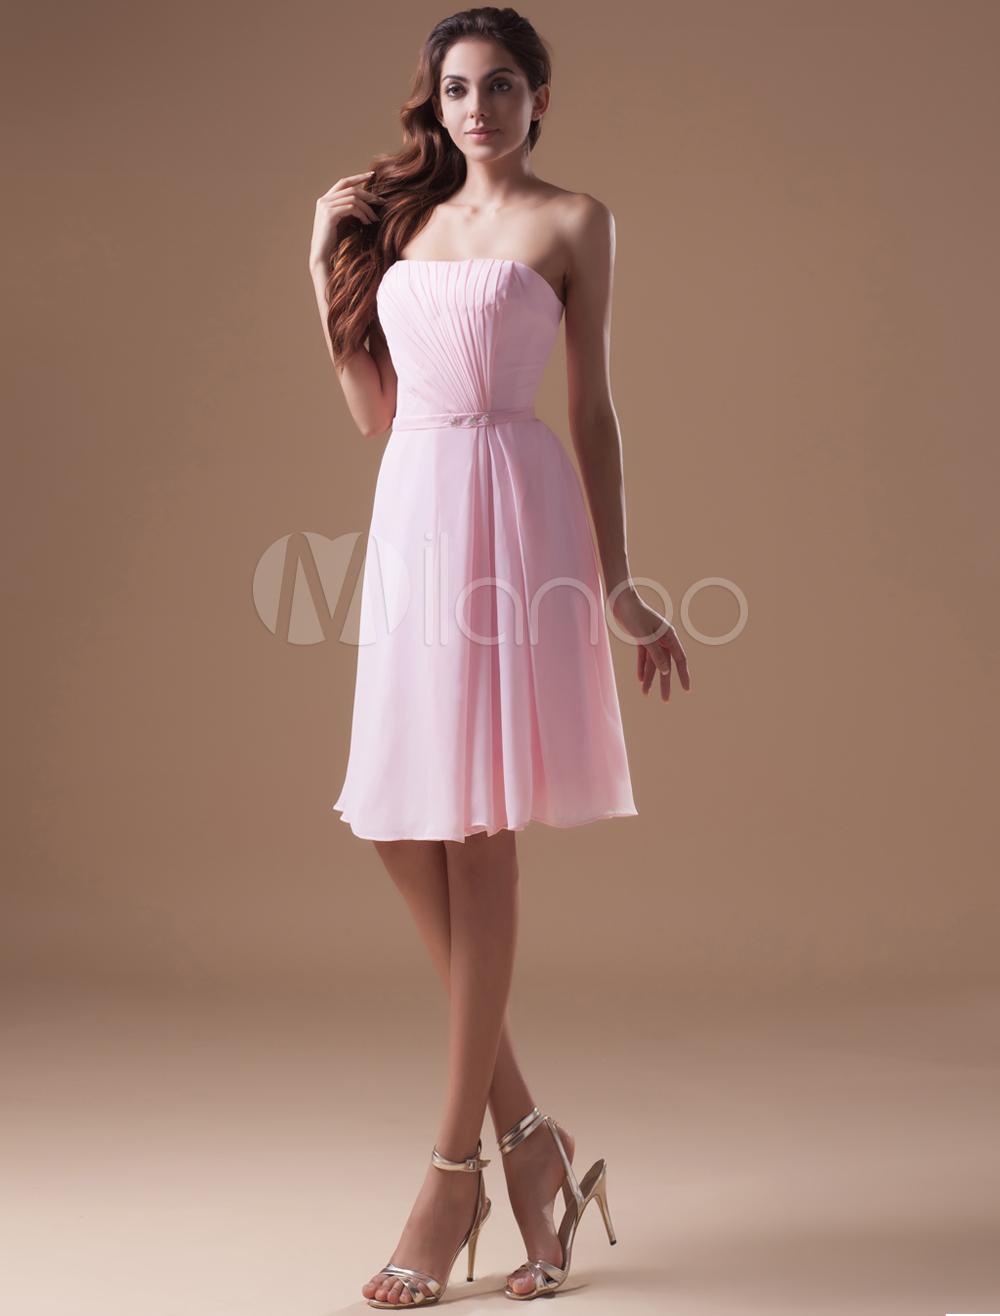 Pink Beading Strapless Chiffon Knee-Length Bridesmaid Dress